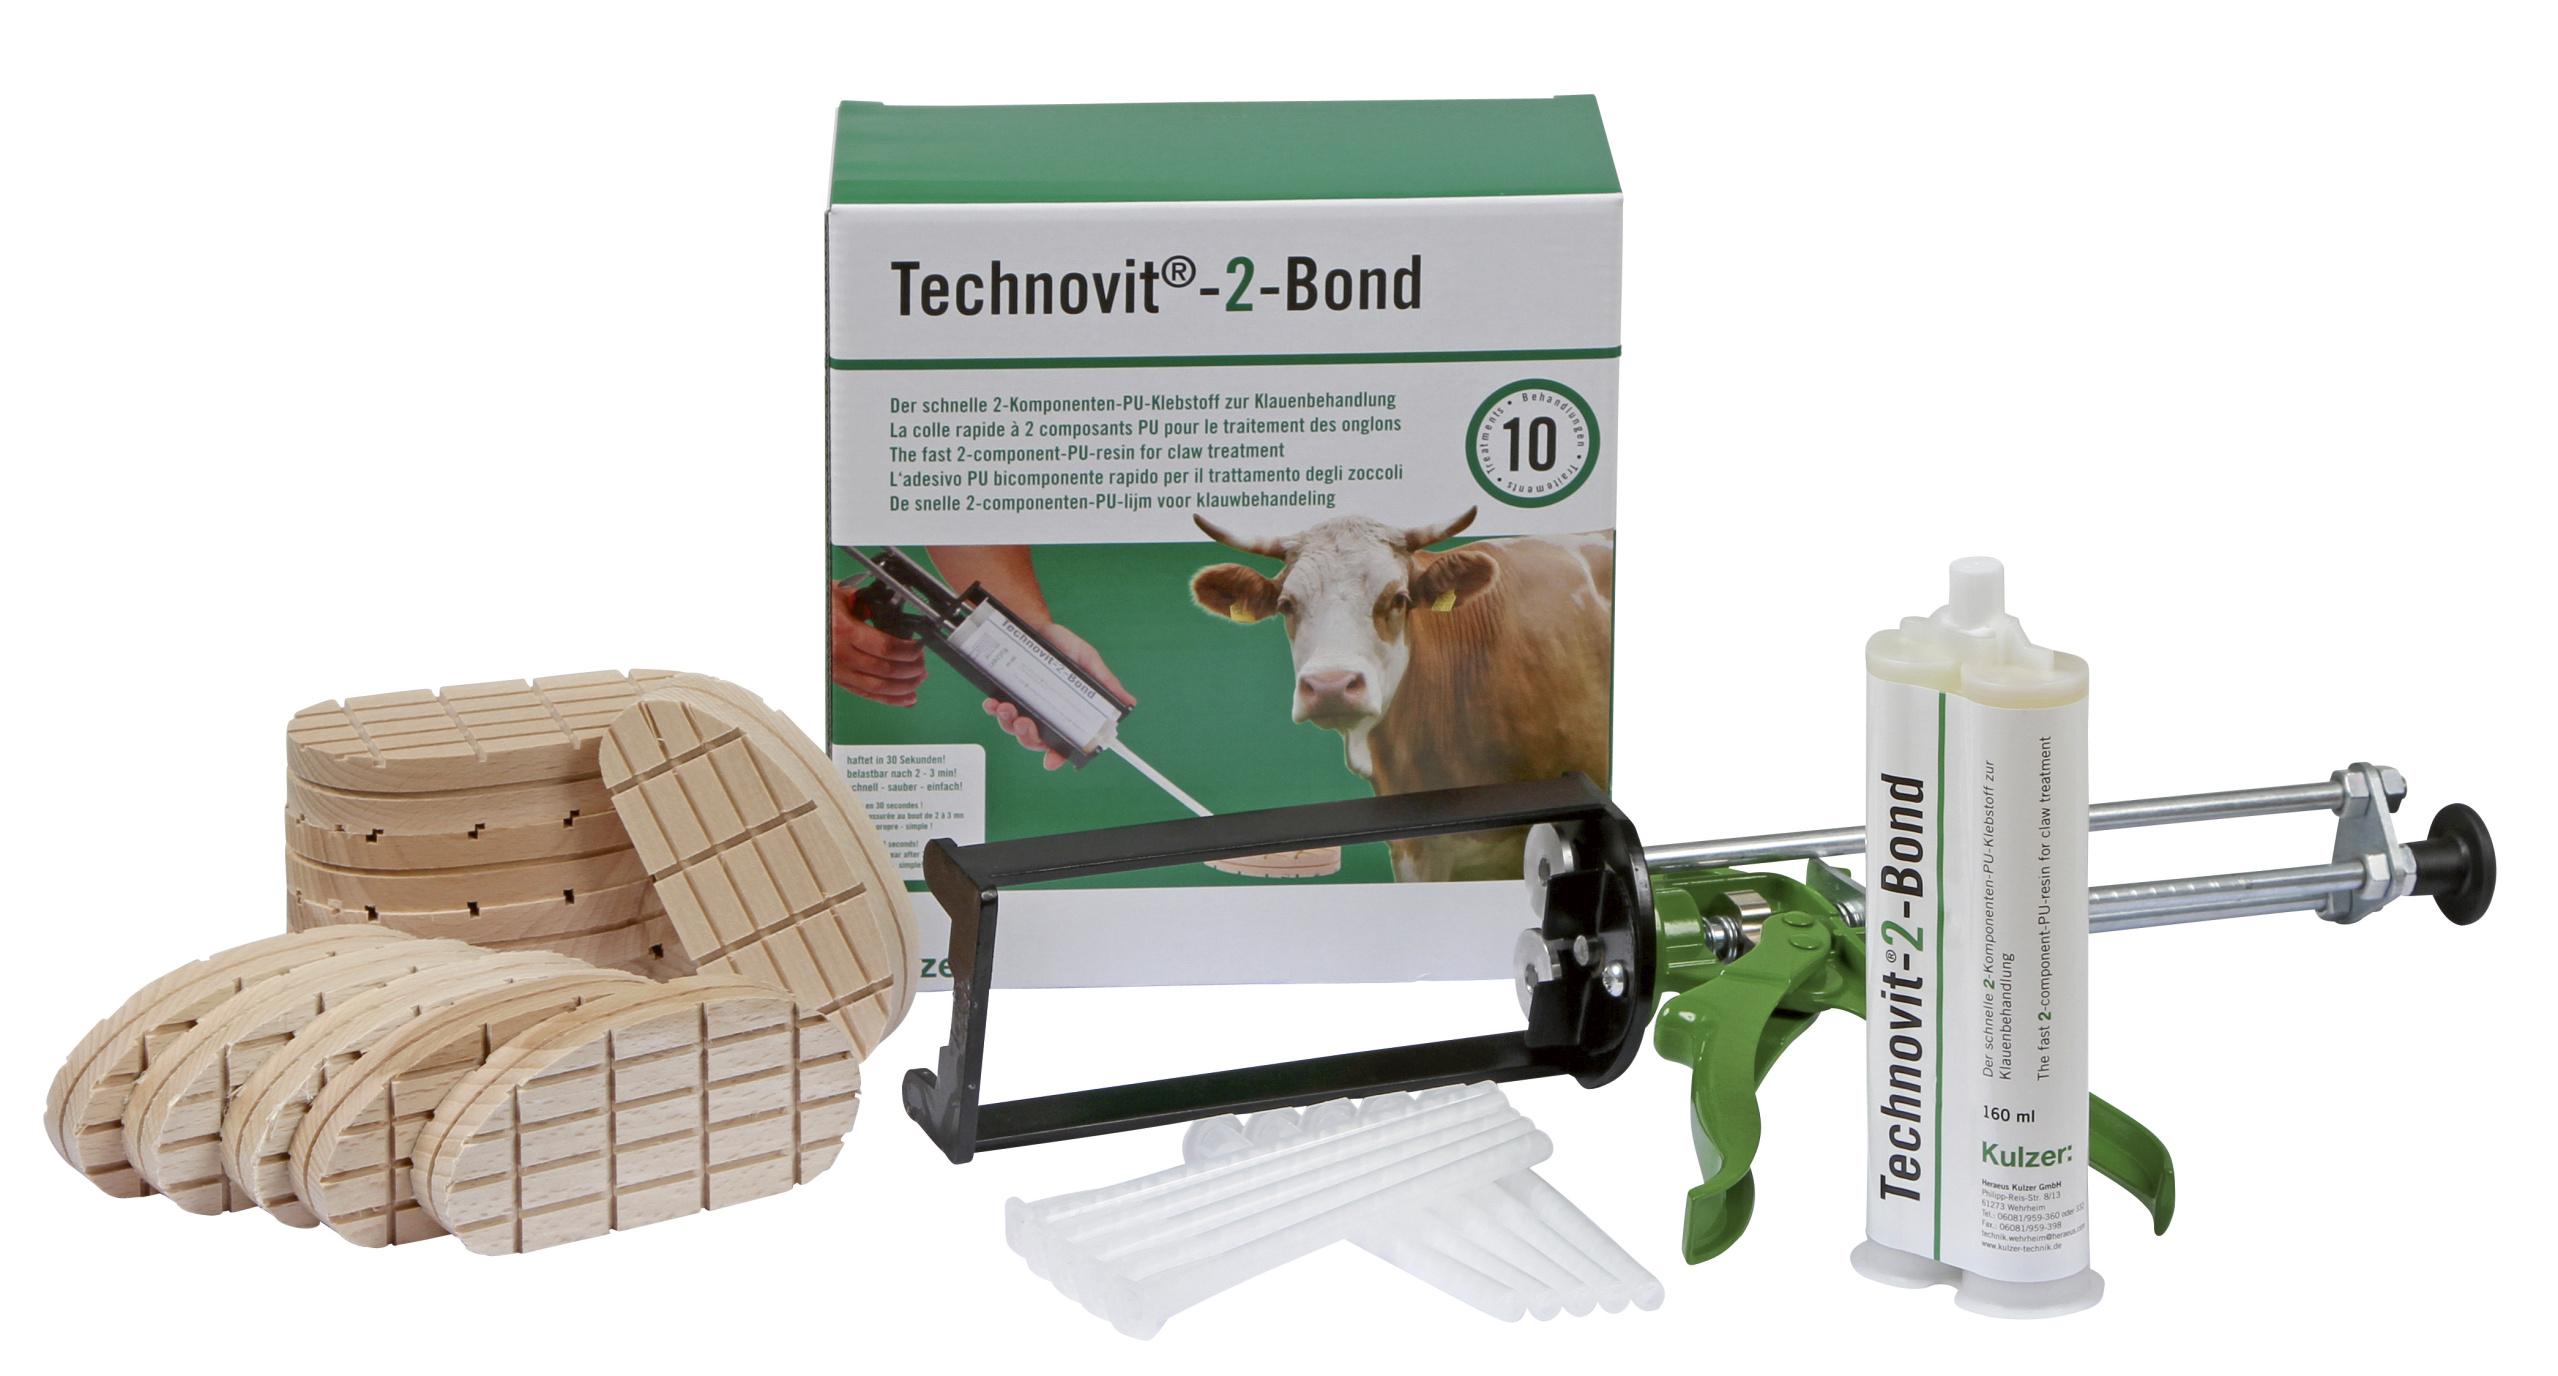 Technovit-2-Bond Starterset, mit Dosierpistole